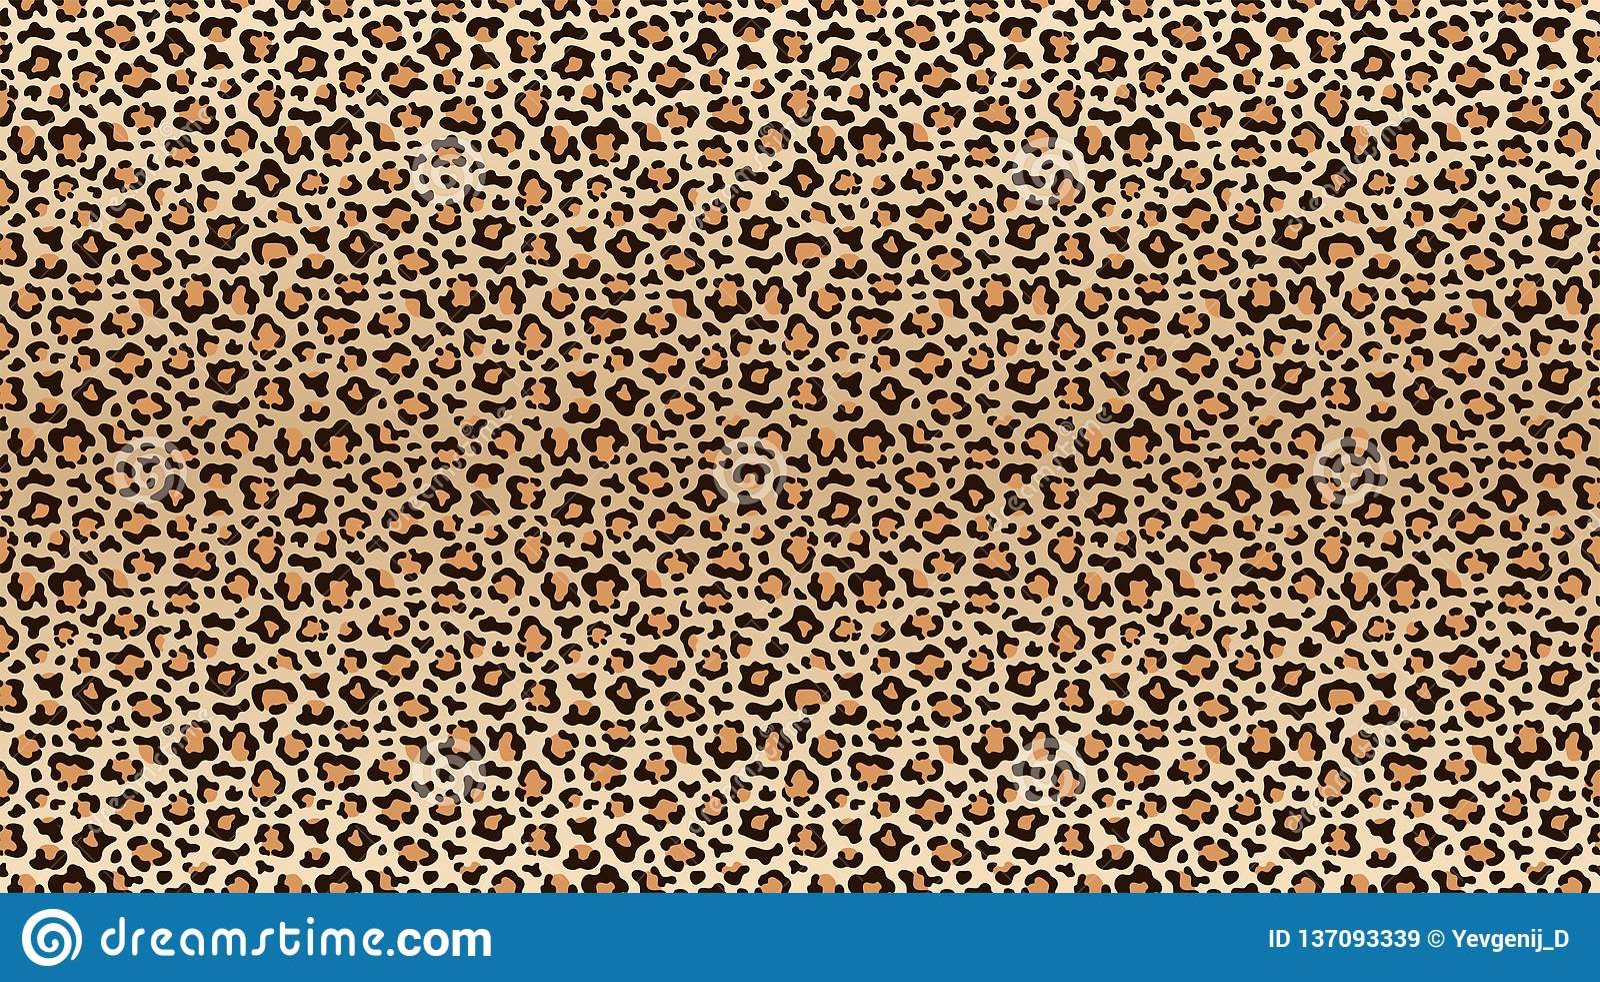 Leopard-Druck-Muster Nahtloses Muster der Leopardhaut Moderne Gepardpelzbeschaffenheit